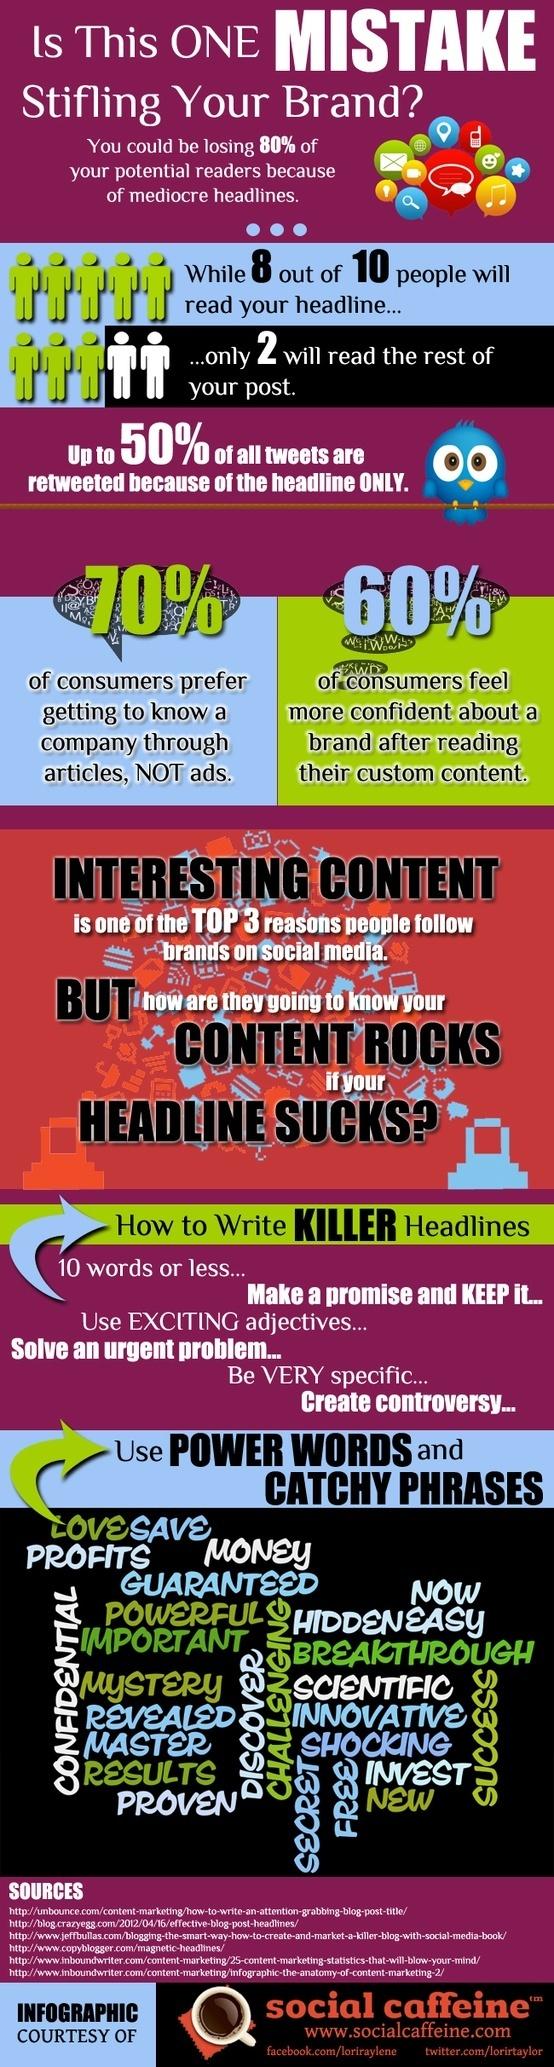 Is this one mistake stifling your brand? #infografia #infographic #SocialMedia